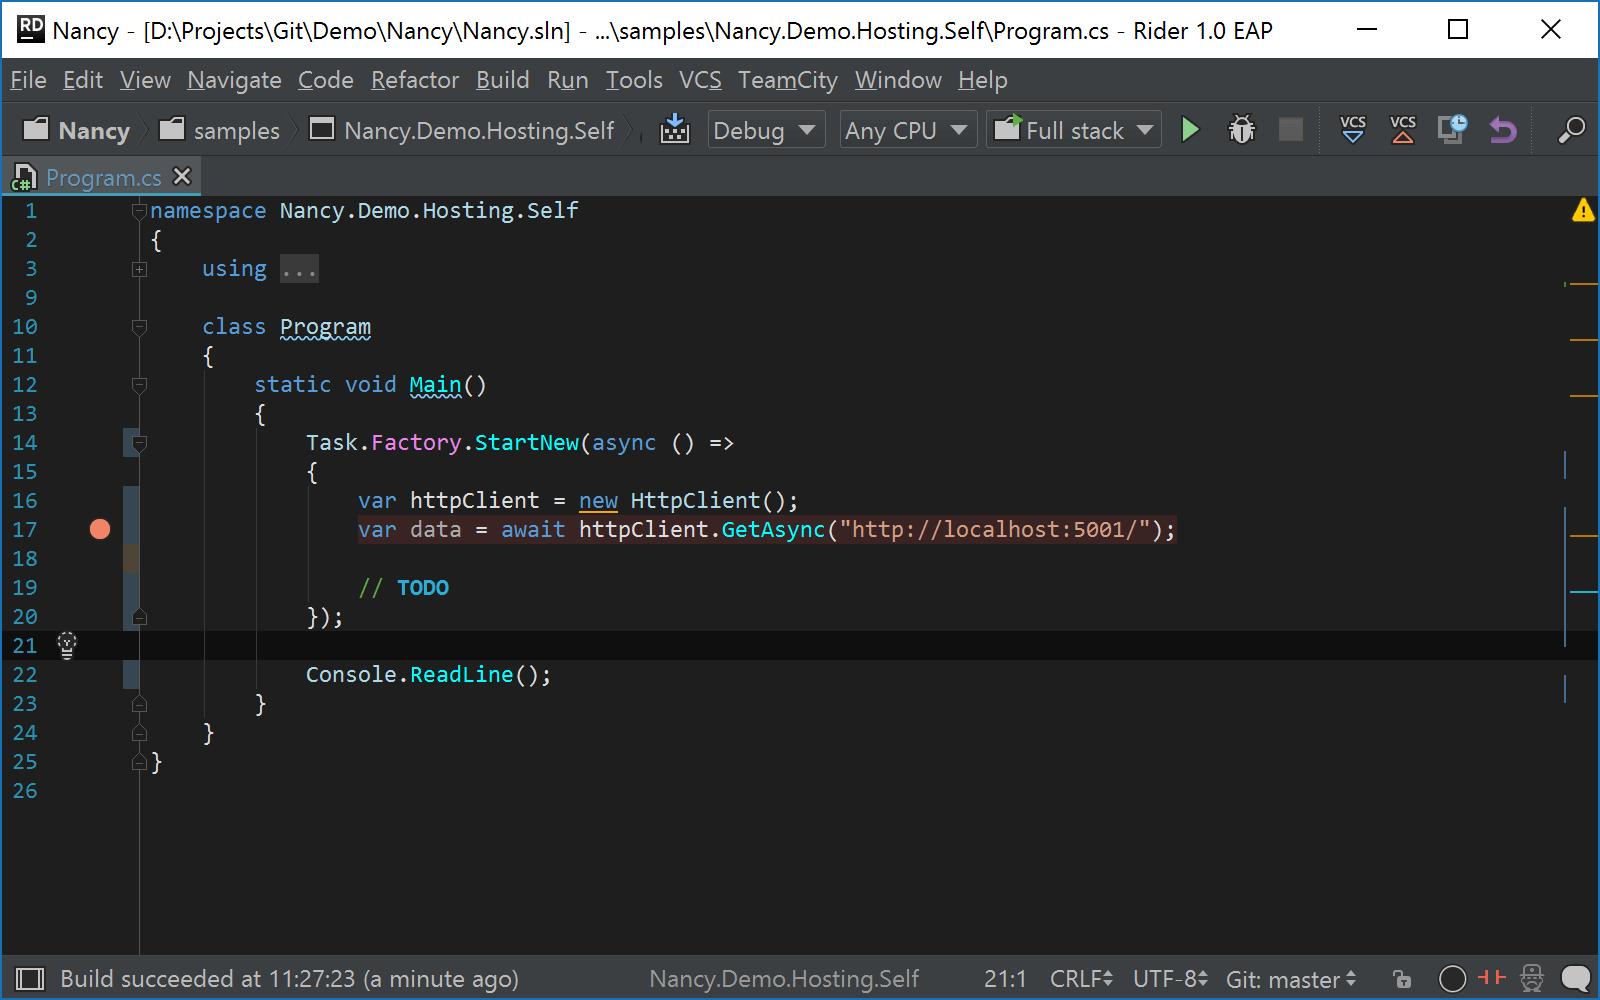 JetBrains Rider: Compound run configuration